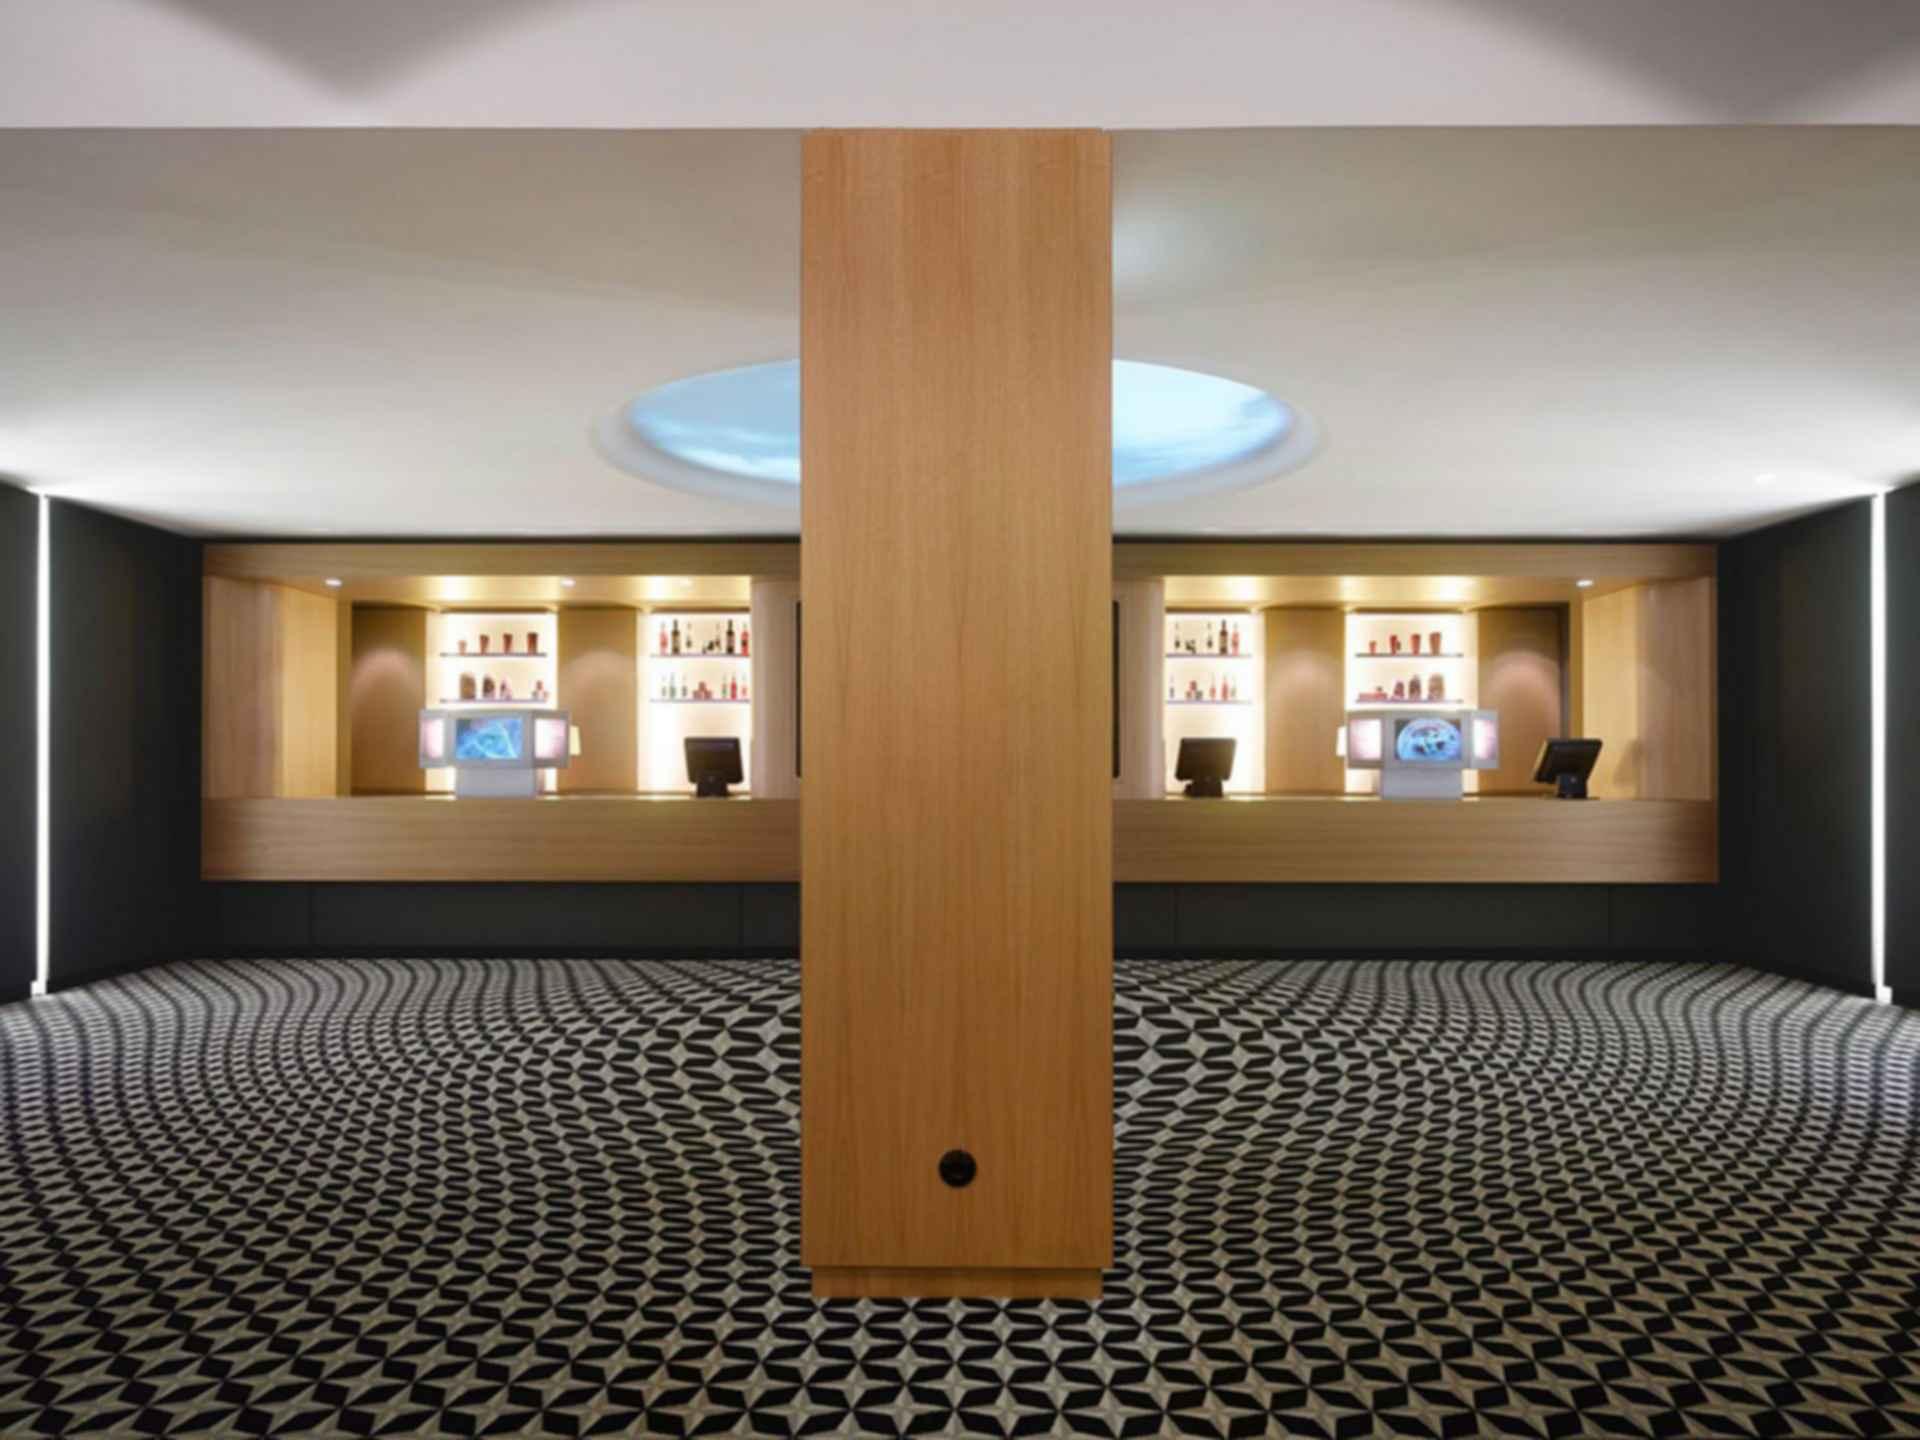 Filmtheater Weltspiegel Cottbus - foyer